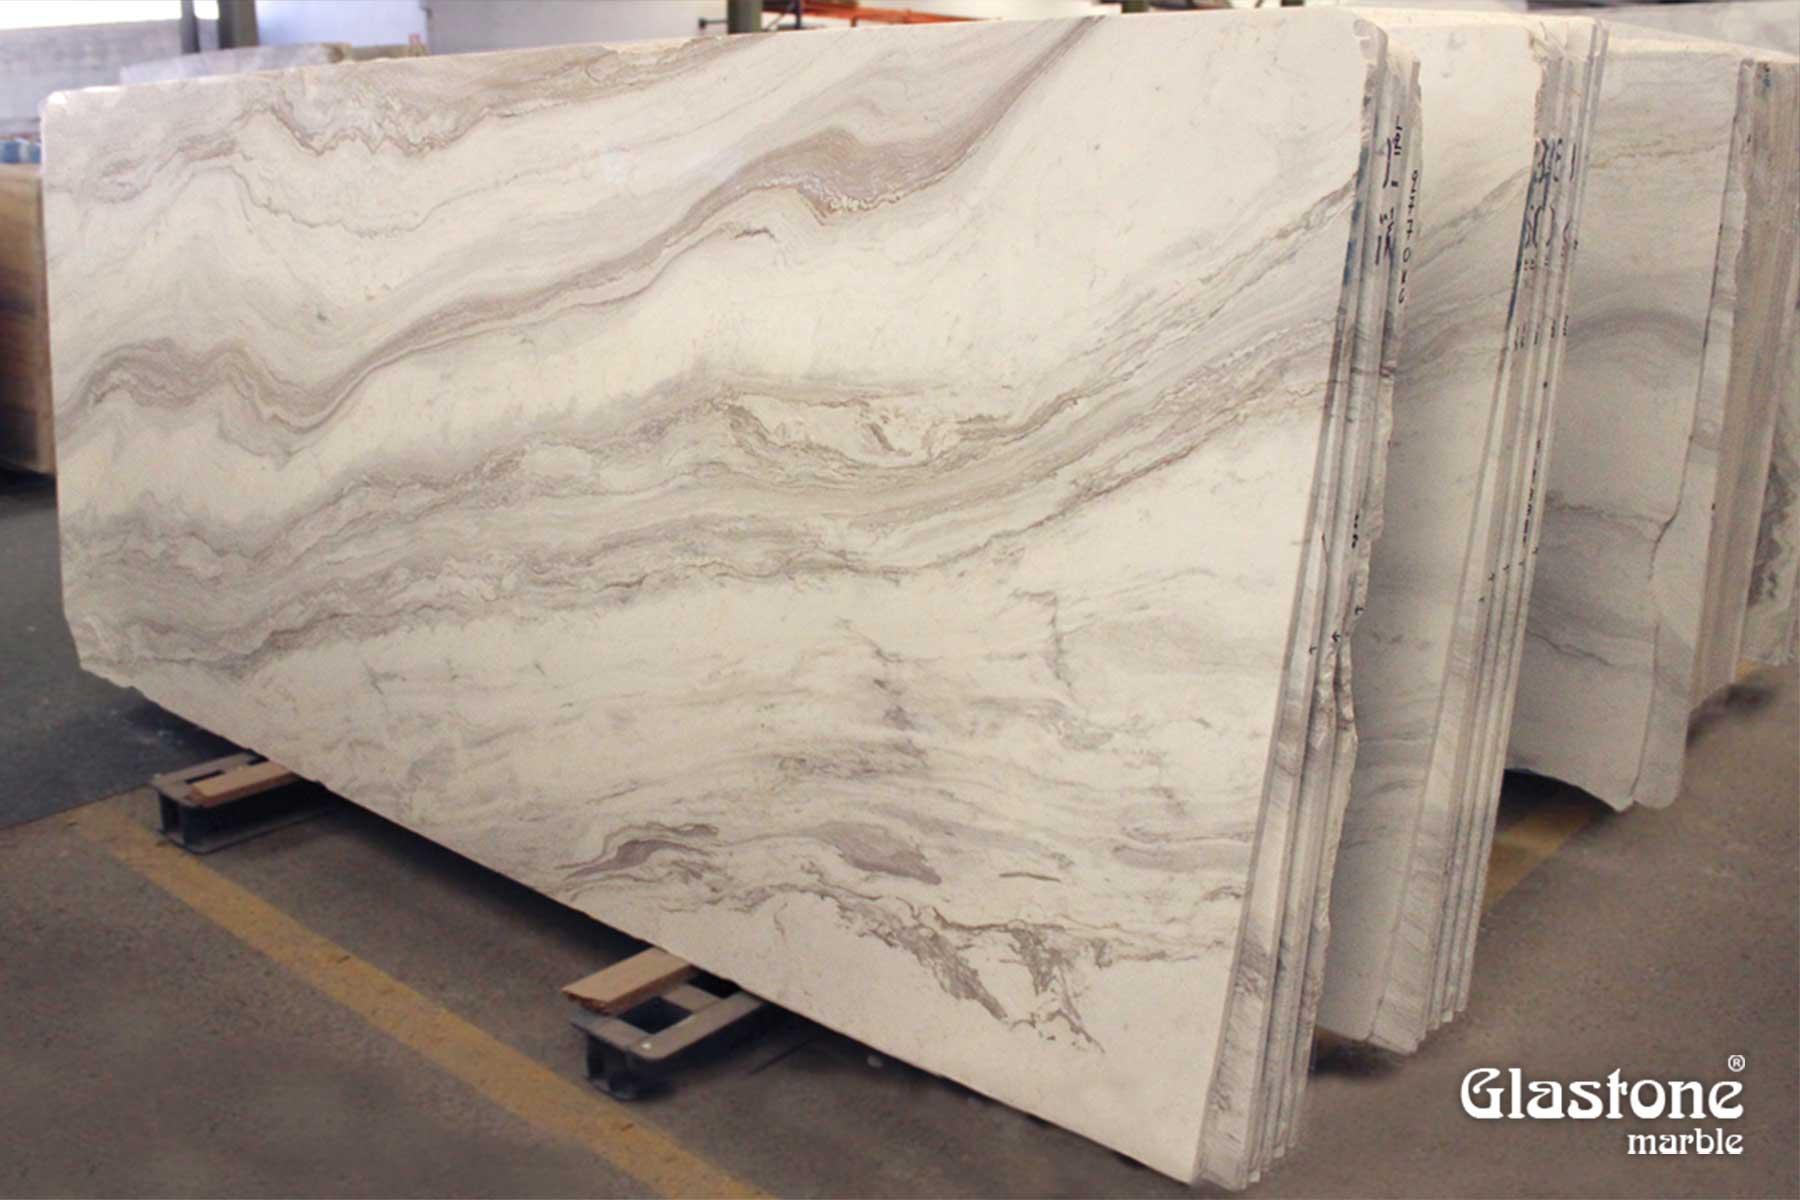 glastone marble marmol solerialaminado vidrio marmol natural volakas